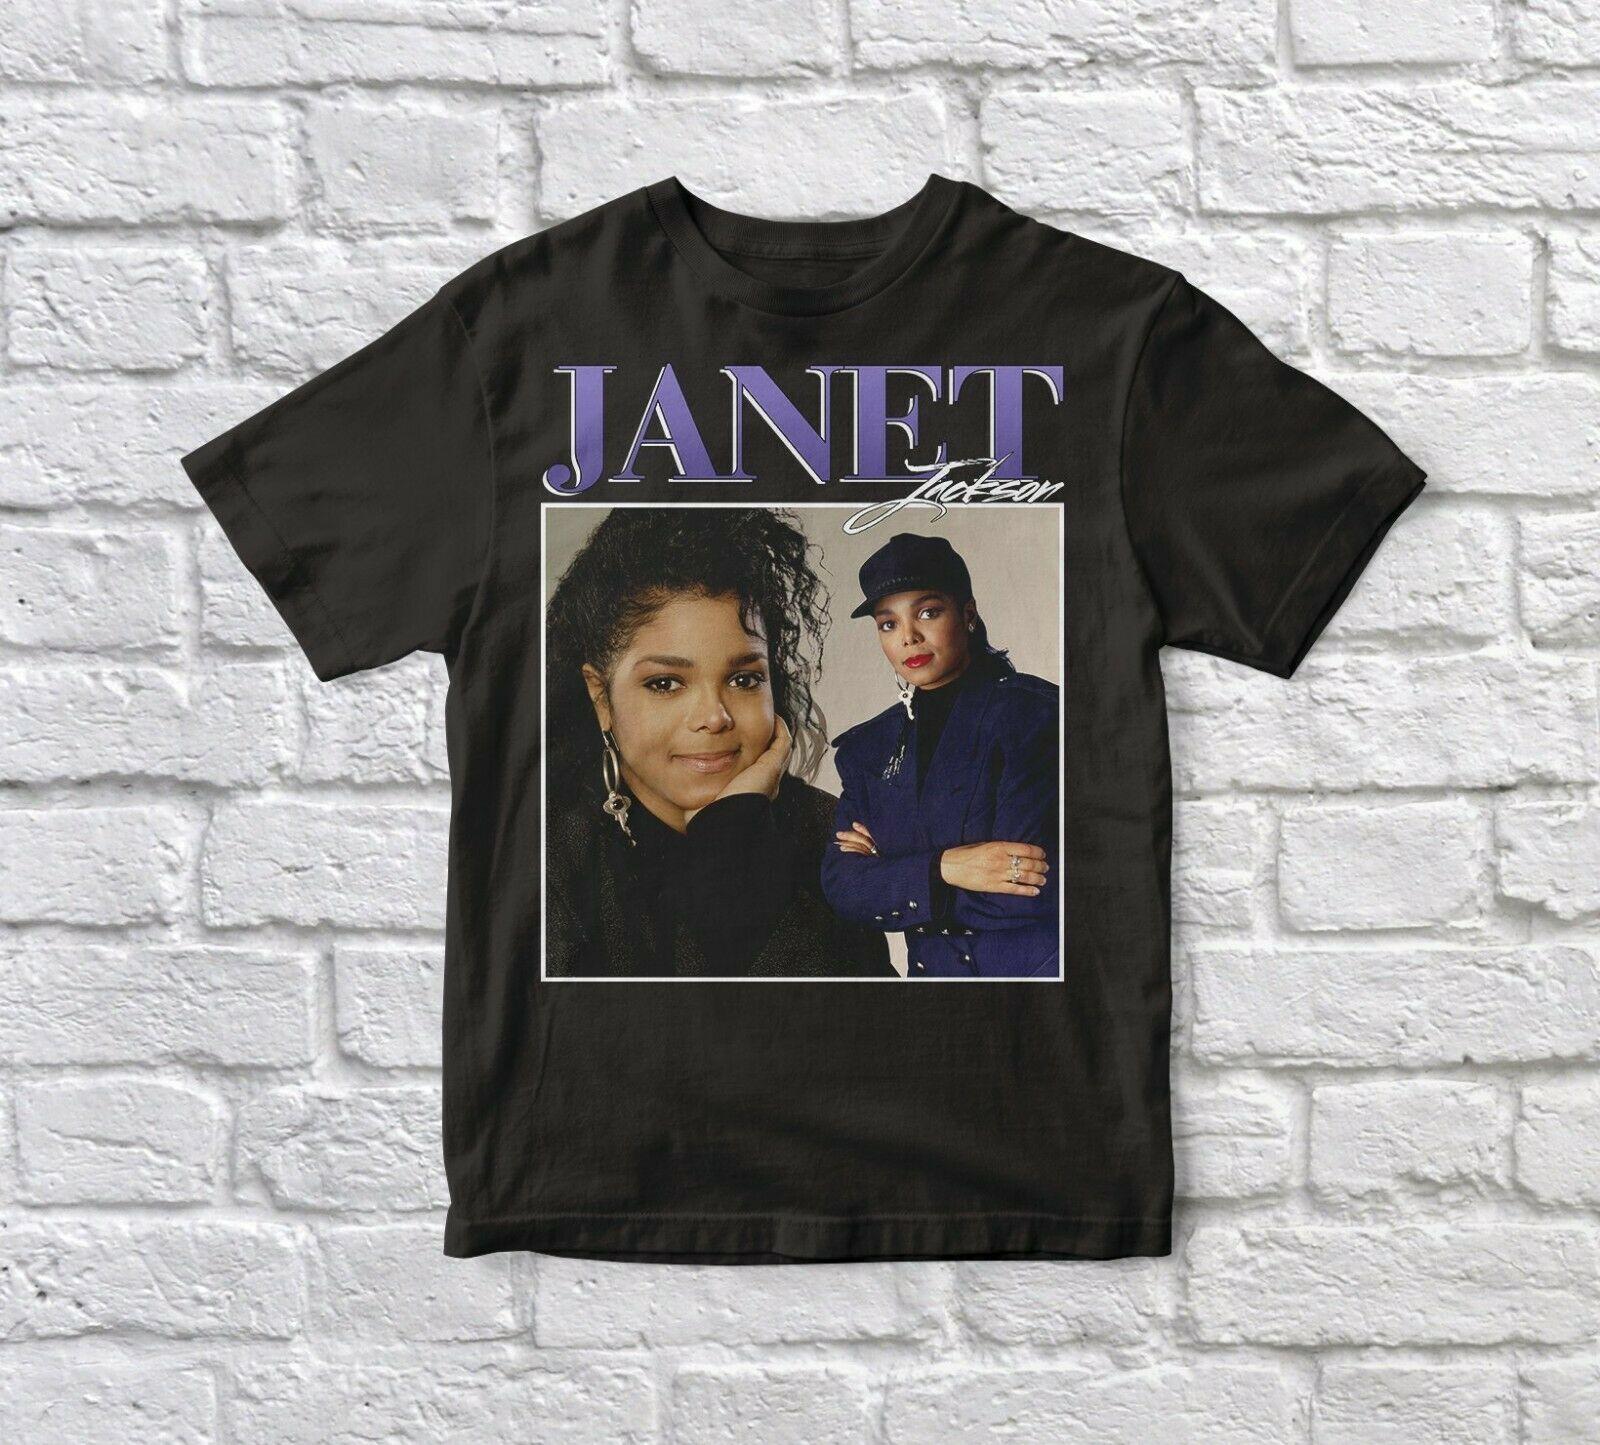 Camiseta Unisex 2019 para hombre negra de Janet Jackson